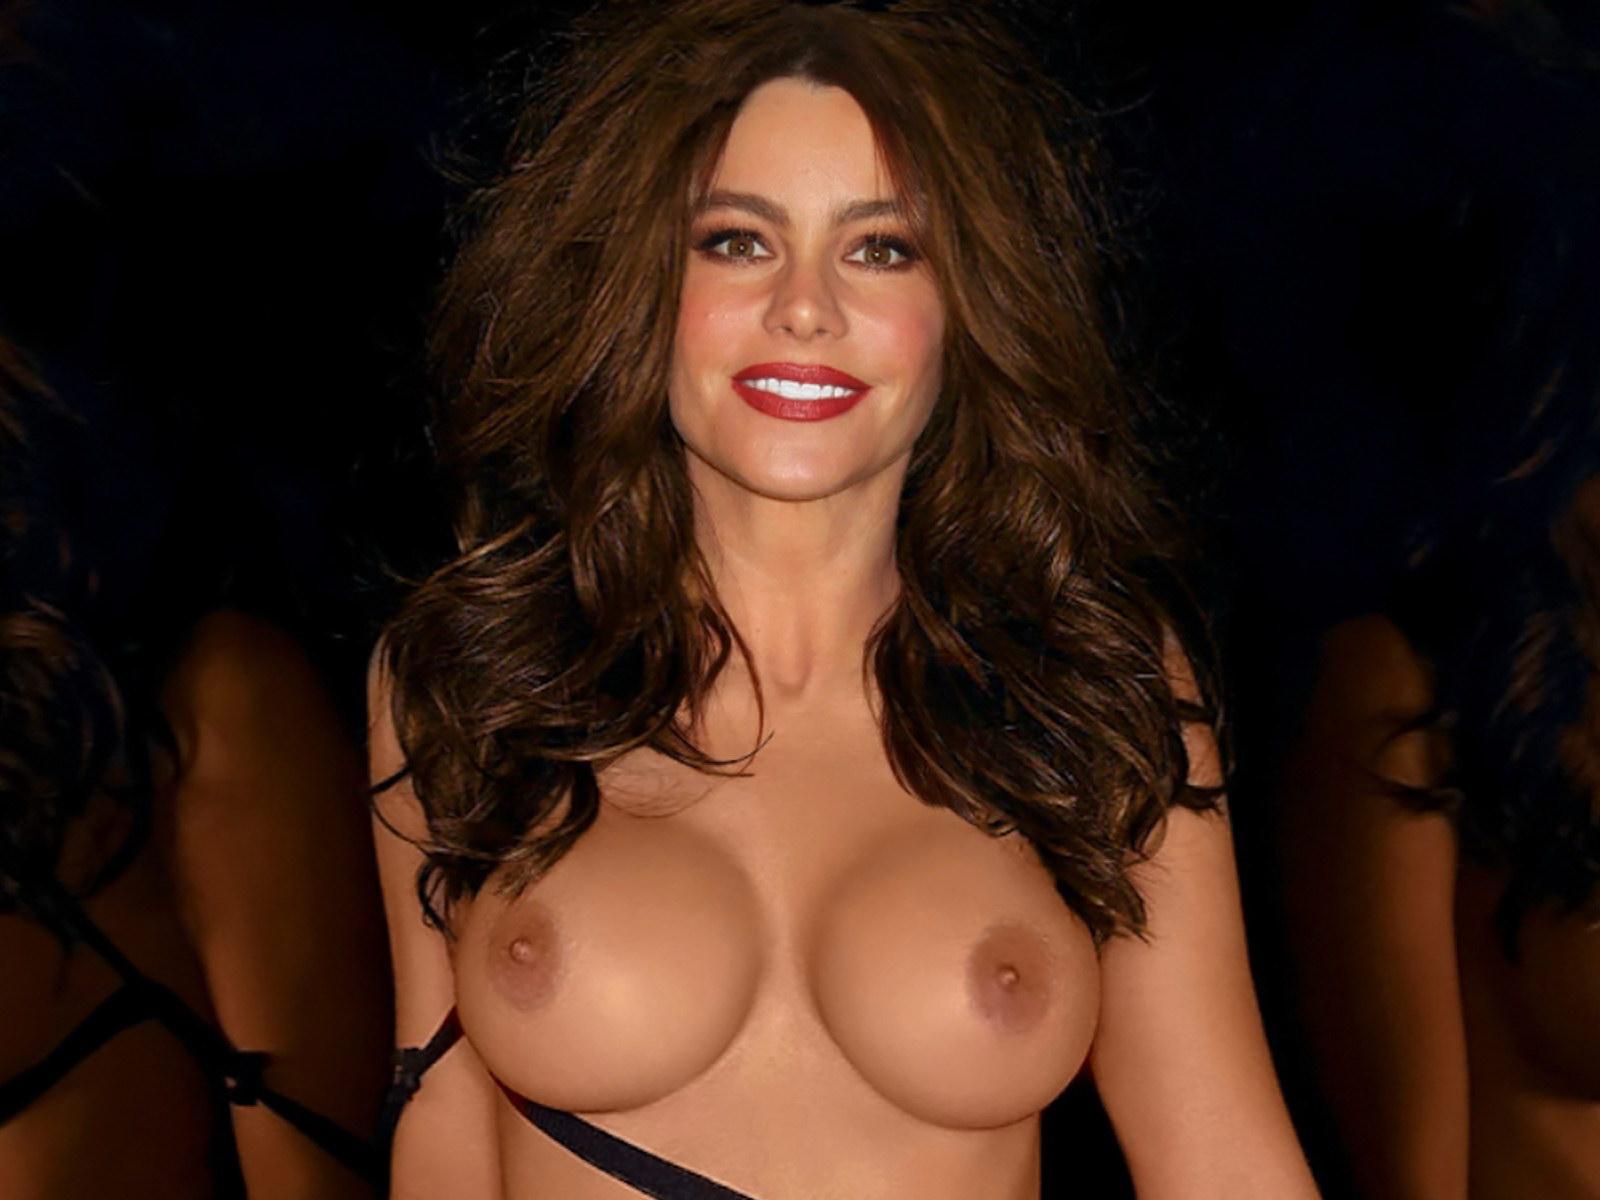 Sofia Vergara Naked Fake Delightful sofia vergara nude